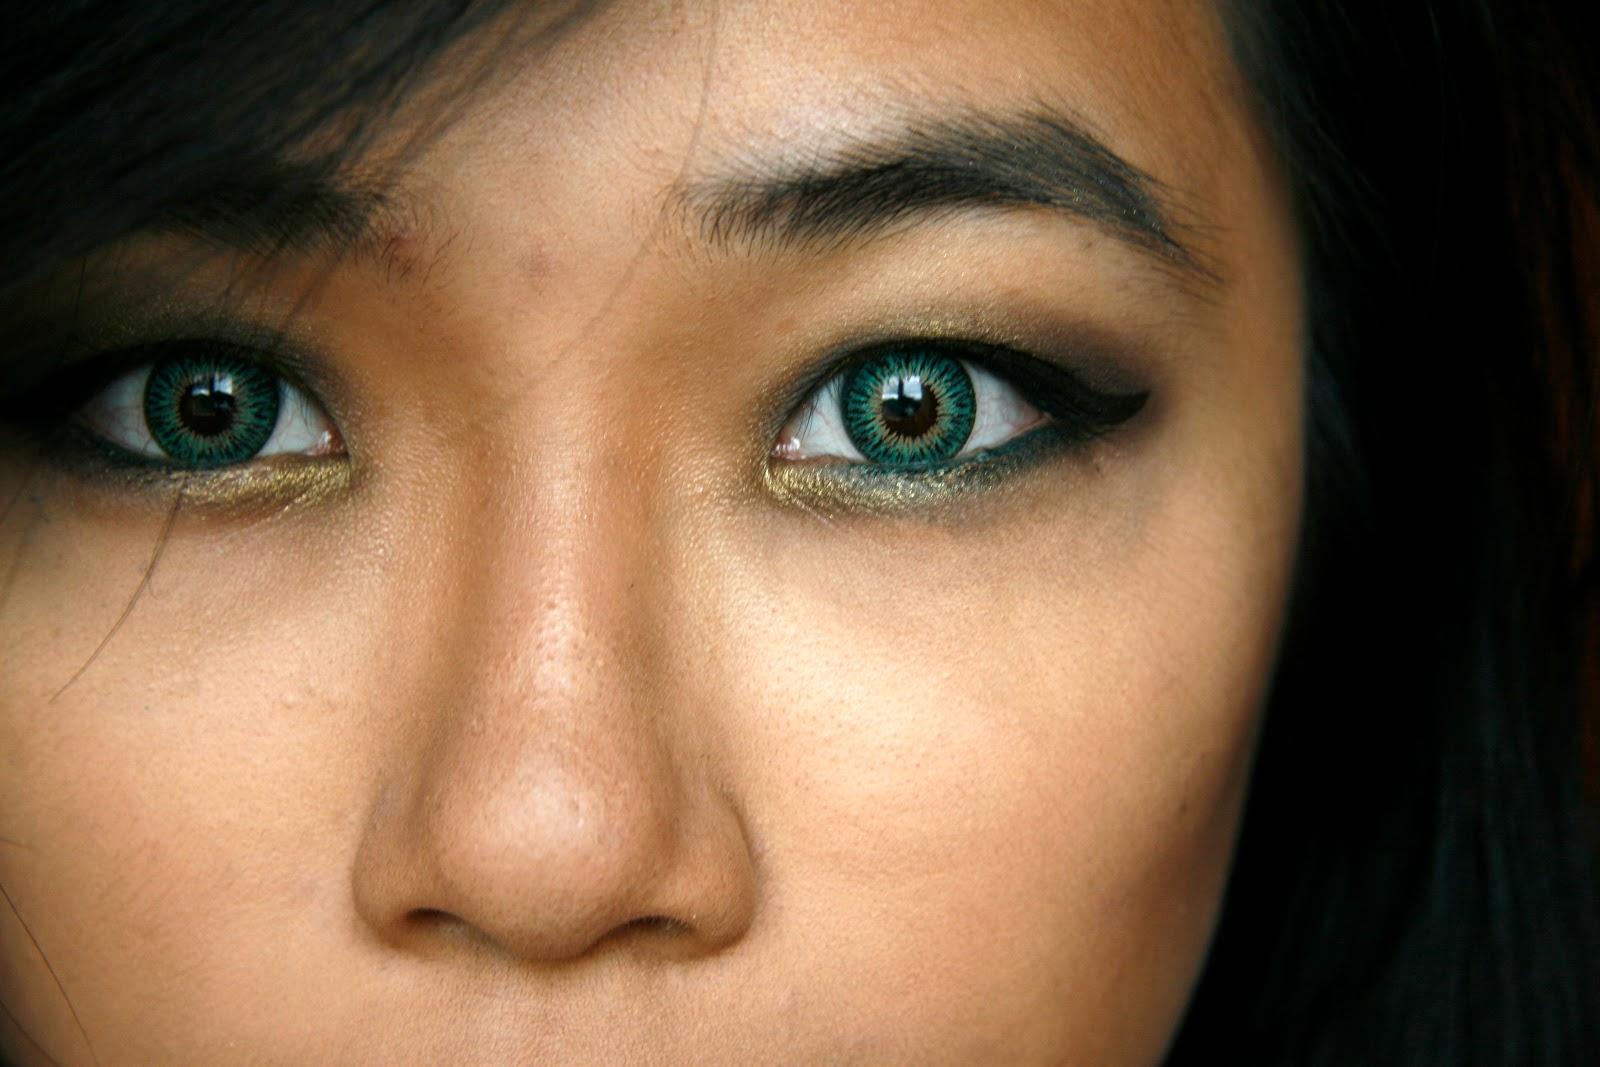 Dark Green Eye Contacts fun size beauty...